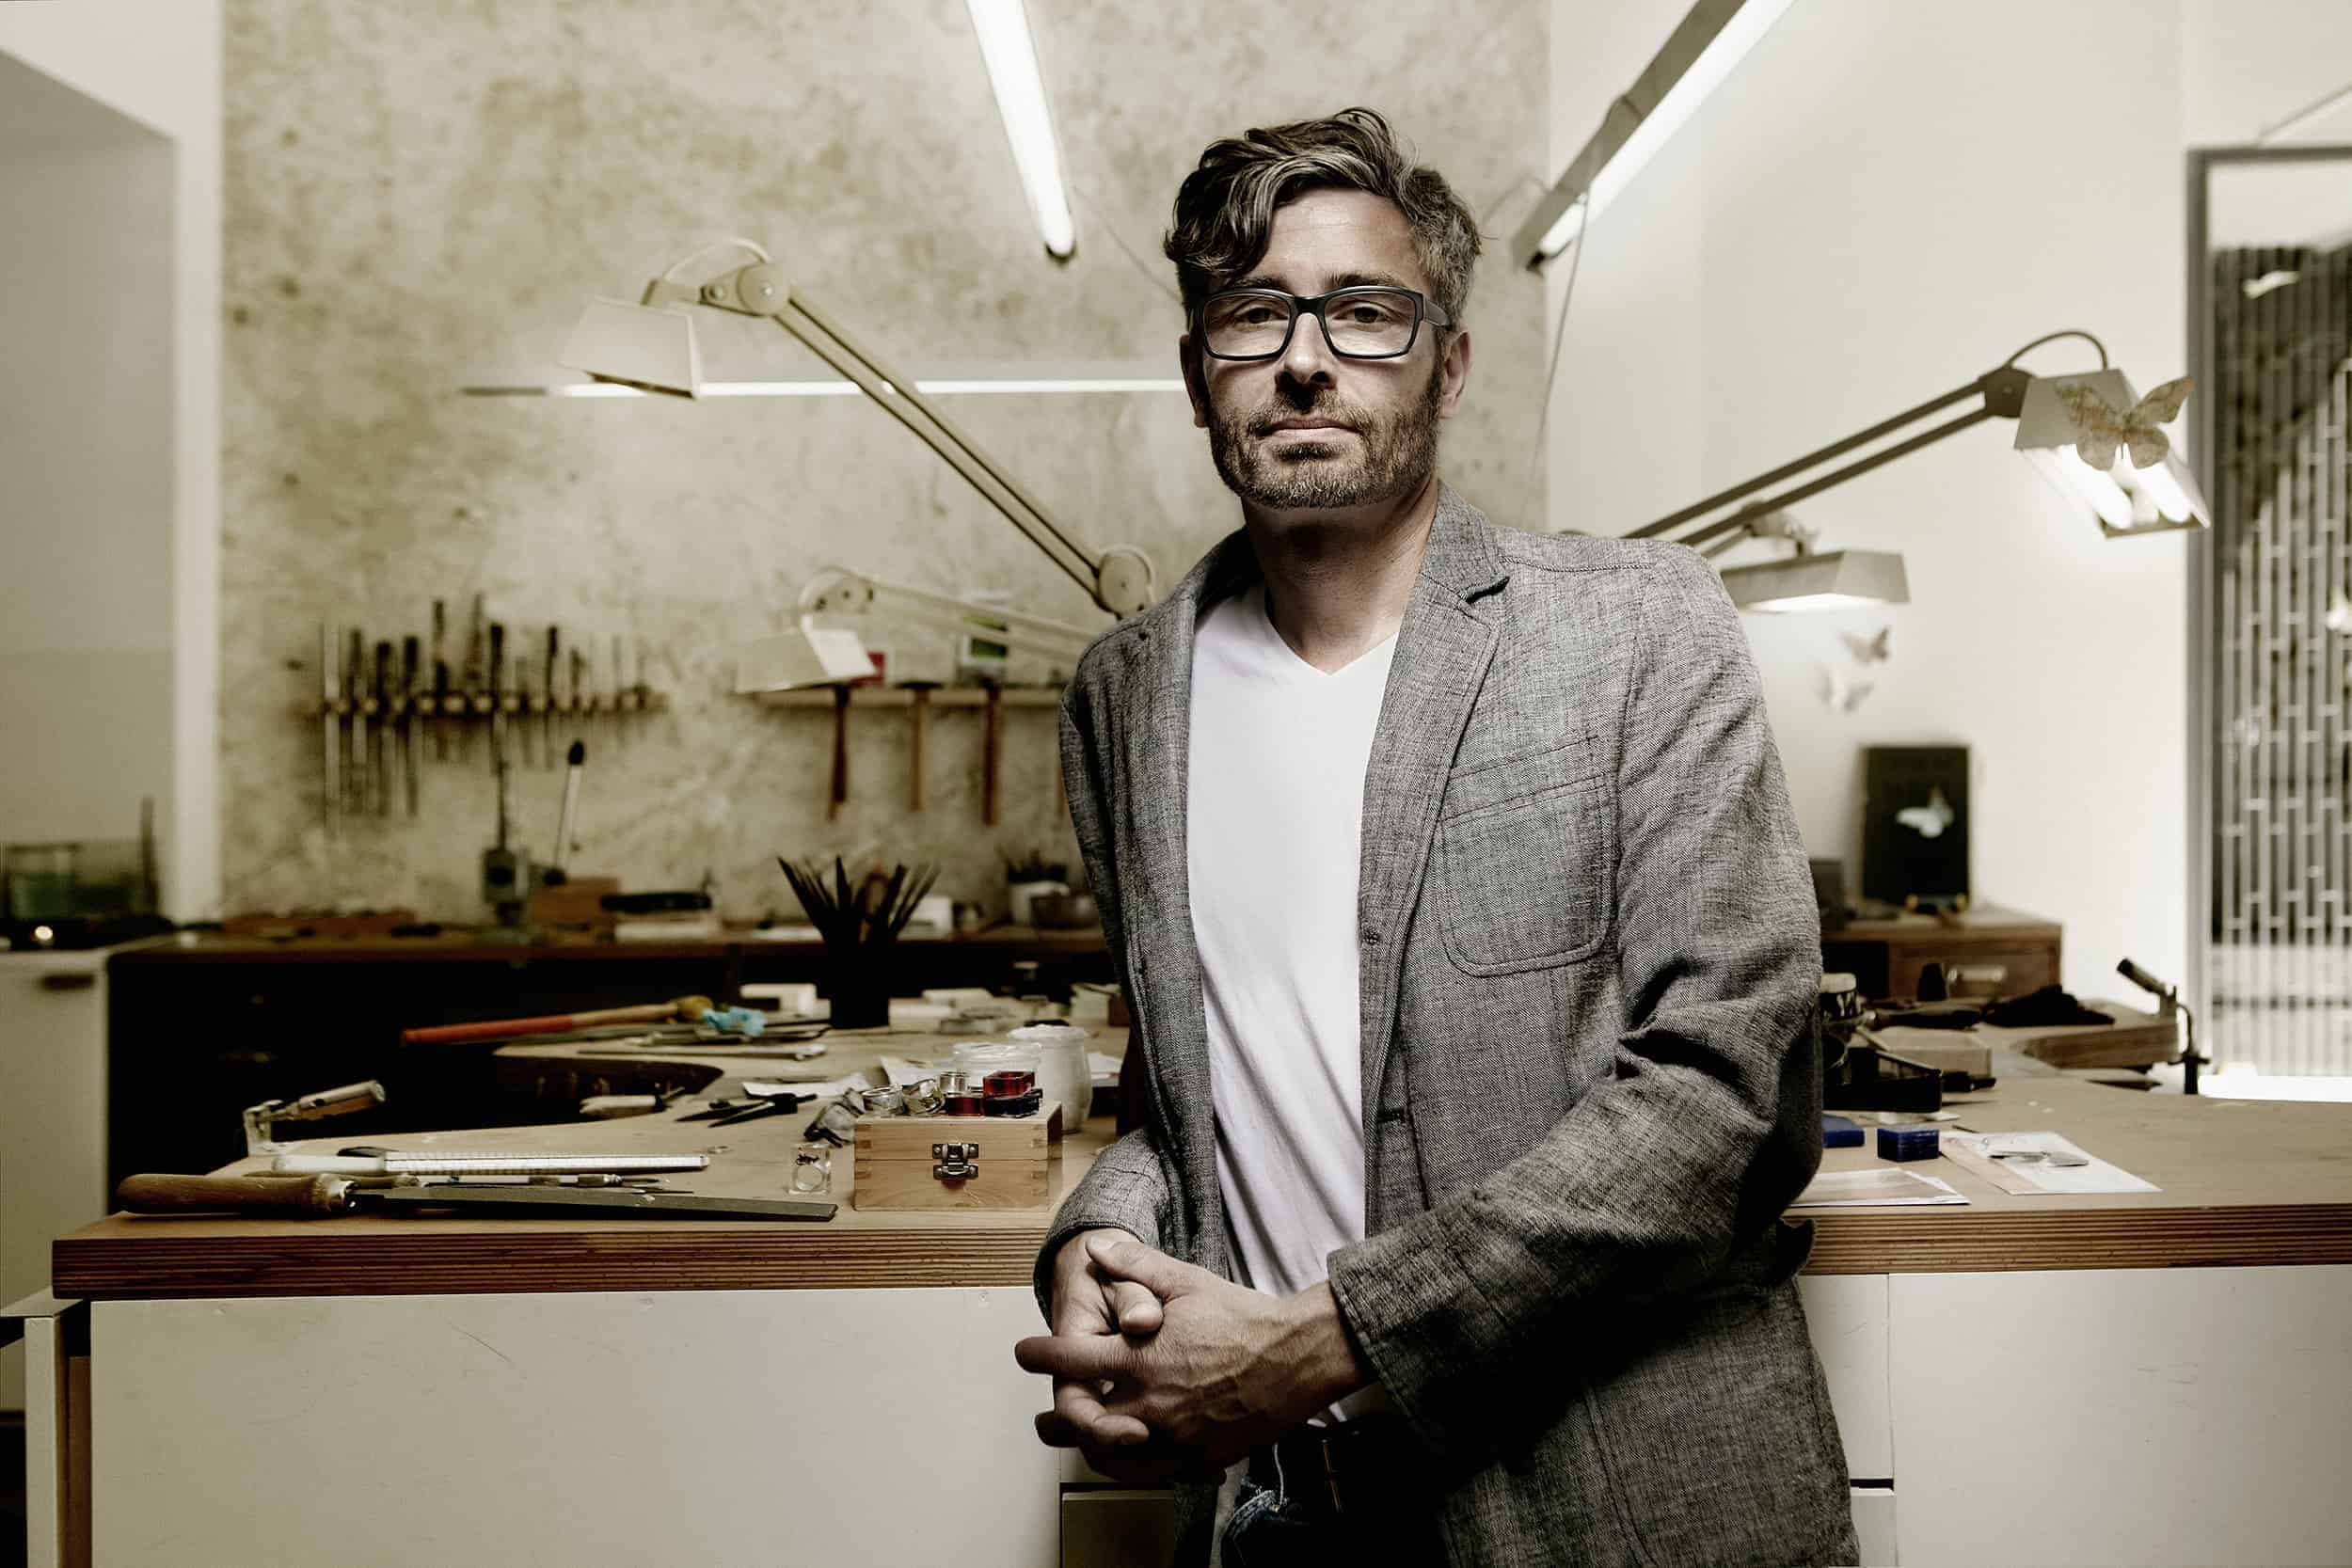 studio-ignatov-portrait-martin-lehmann-01